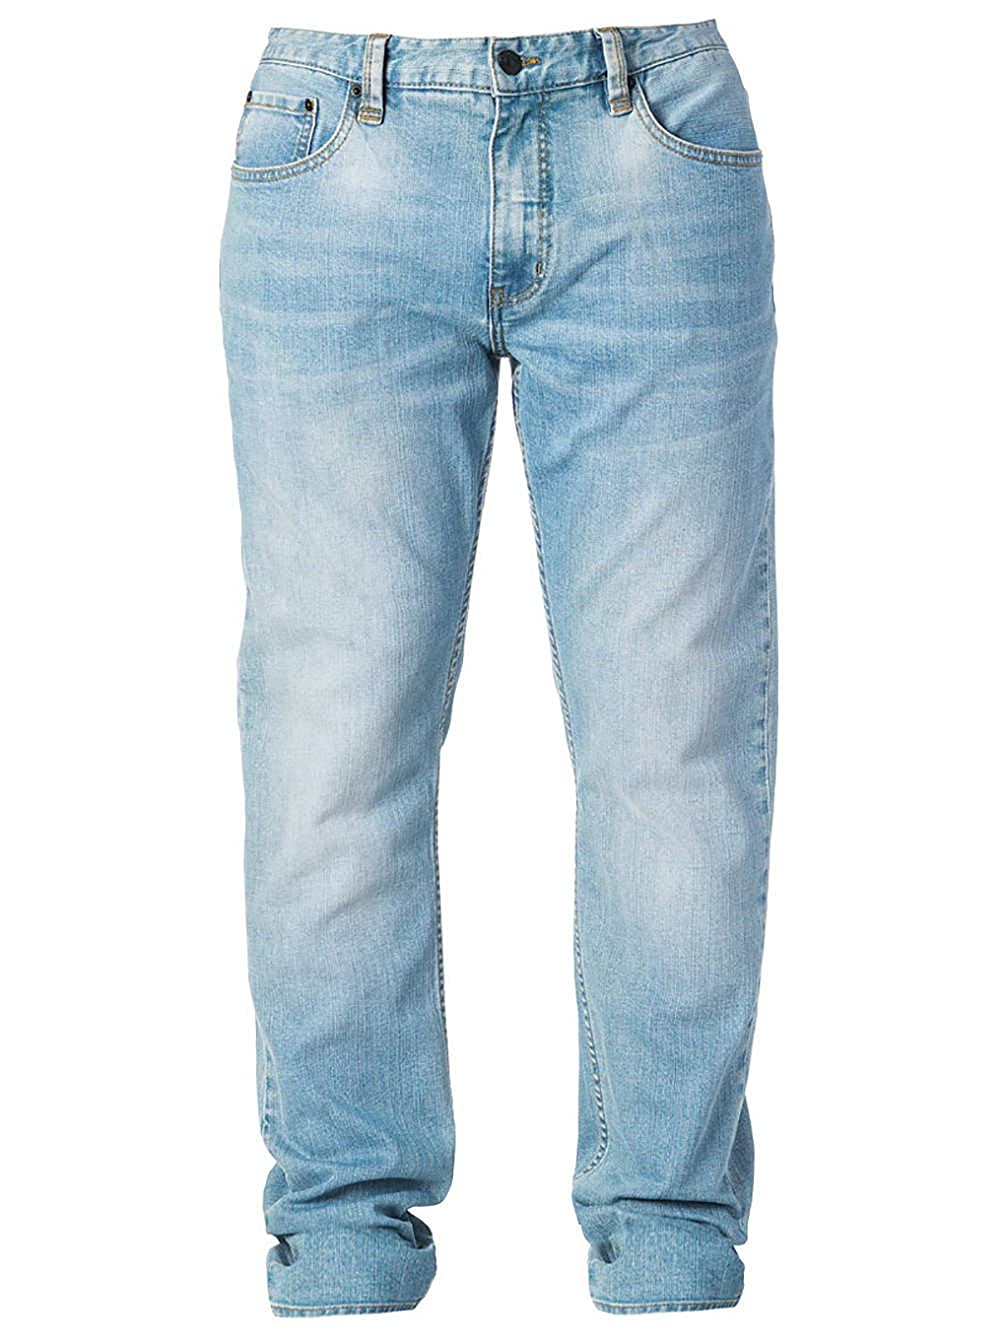 RIP CURL Jeans Pantalones vaqueros rectos para hombre Azul ...